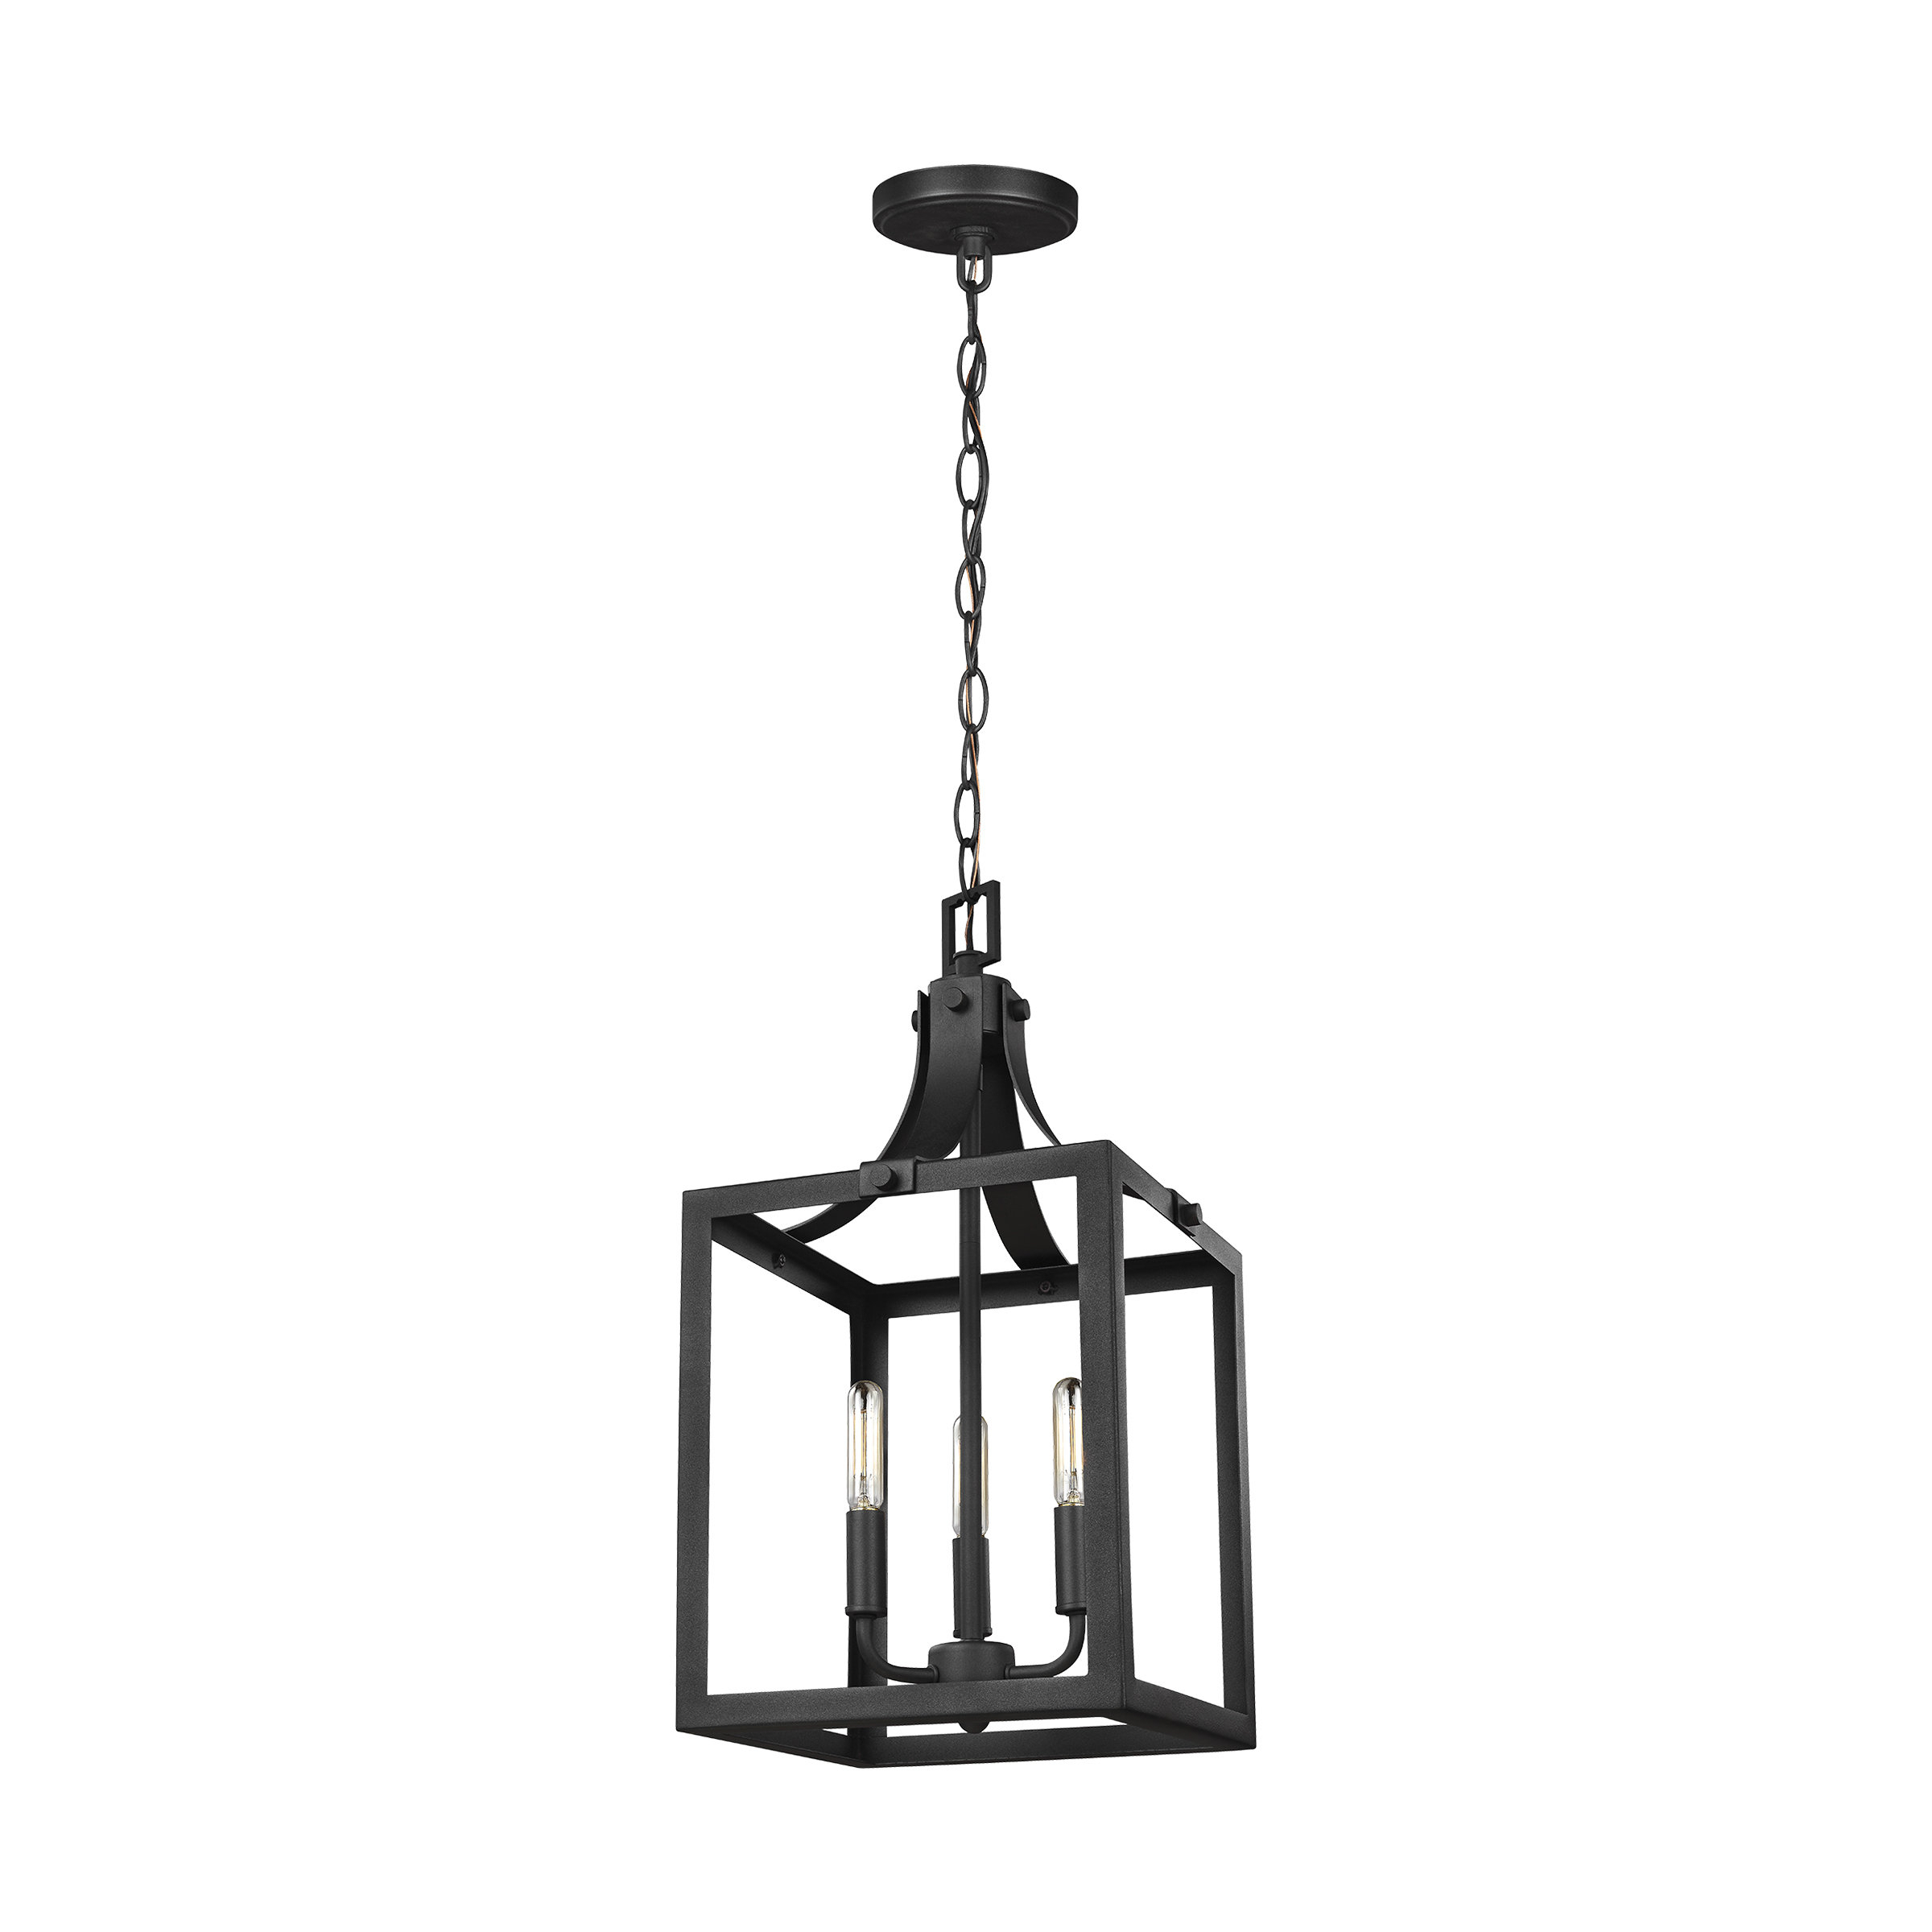 Gracie Oaks Sherri-Ann 3-Light Lantern Square / Rectangle Pendant pertaining to Odie 8-Light Lantern Square / Rectangle Pendants (Image 10 of 30)